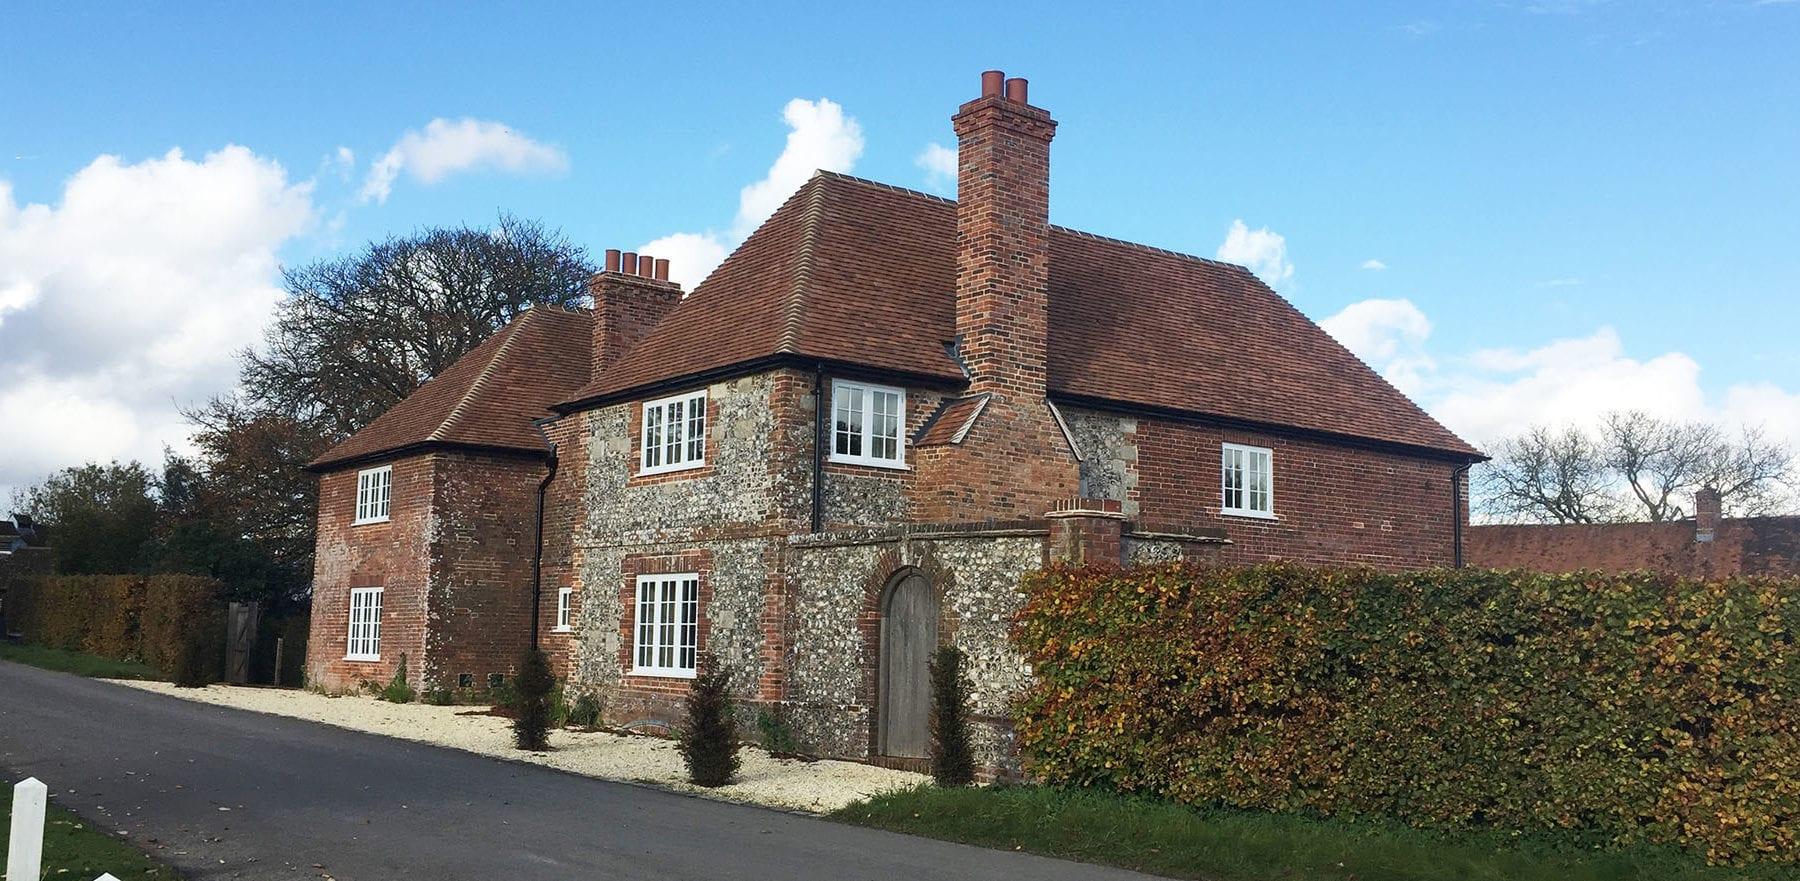 Lifestiles - Handmade Heather Clay Roof Tiles - Barlow, England